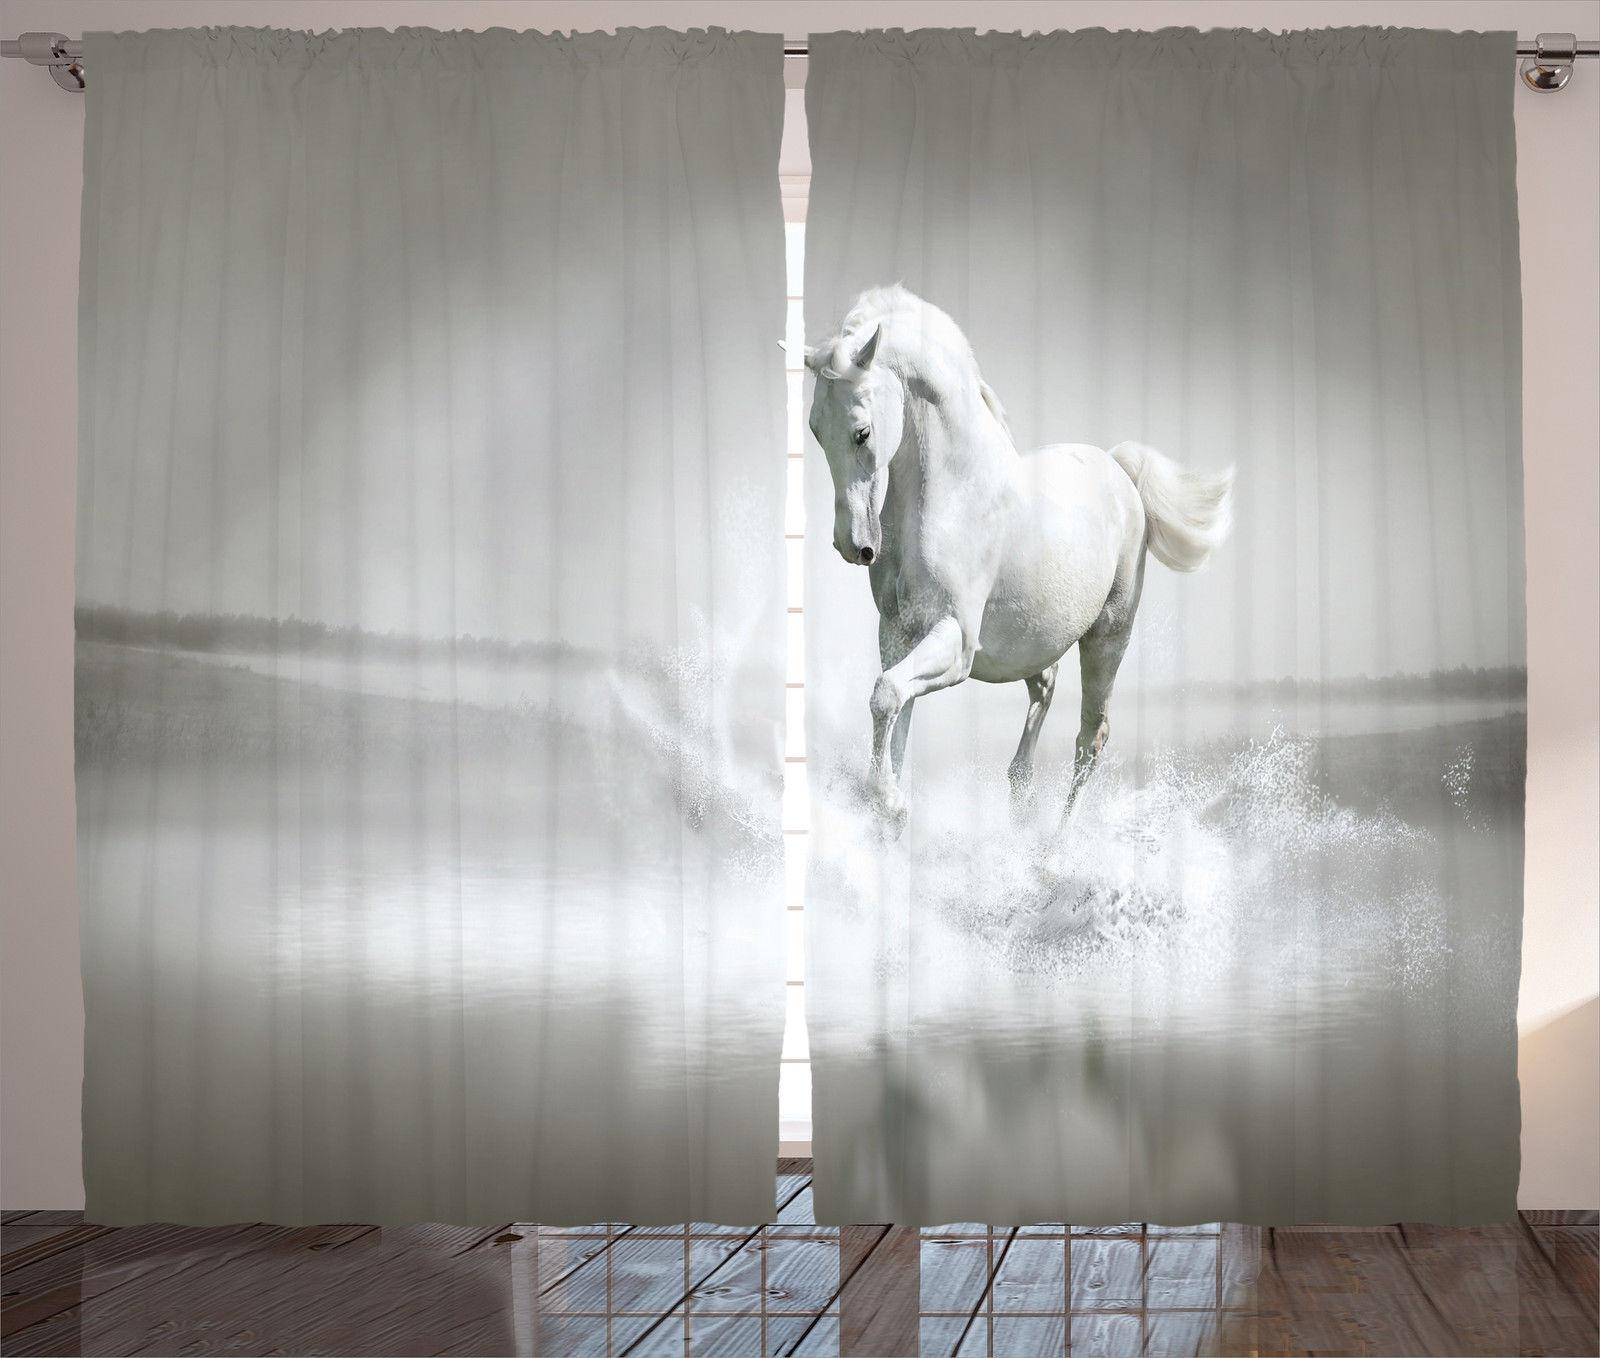 Cloud Window Curtains 3d Printing Nautical Home Decor: Horse Running Through Water Motivation Life Wild Animals